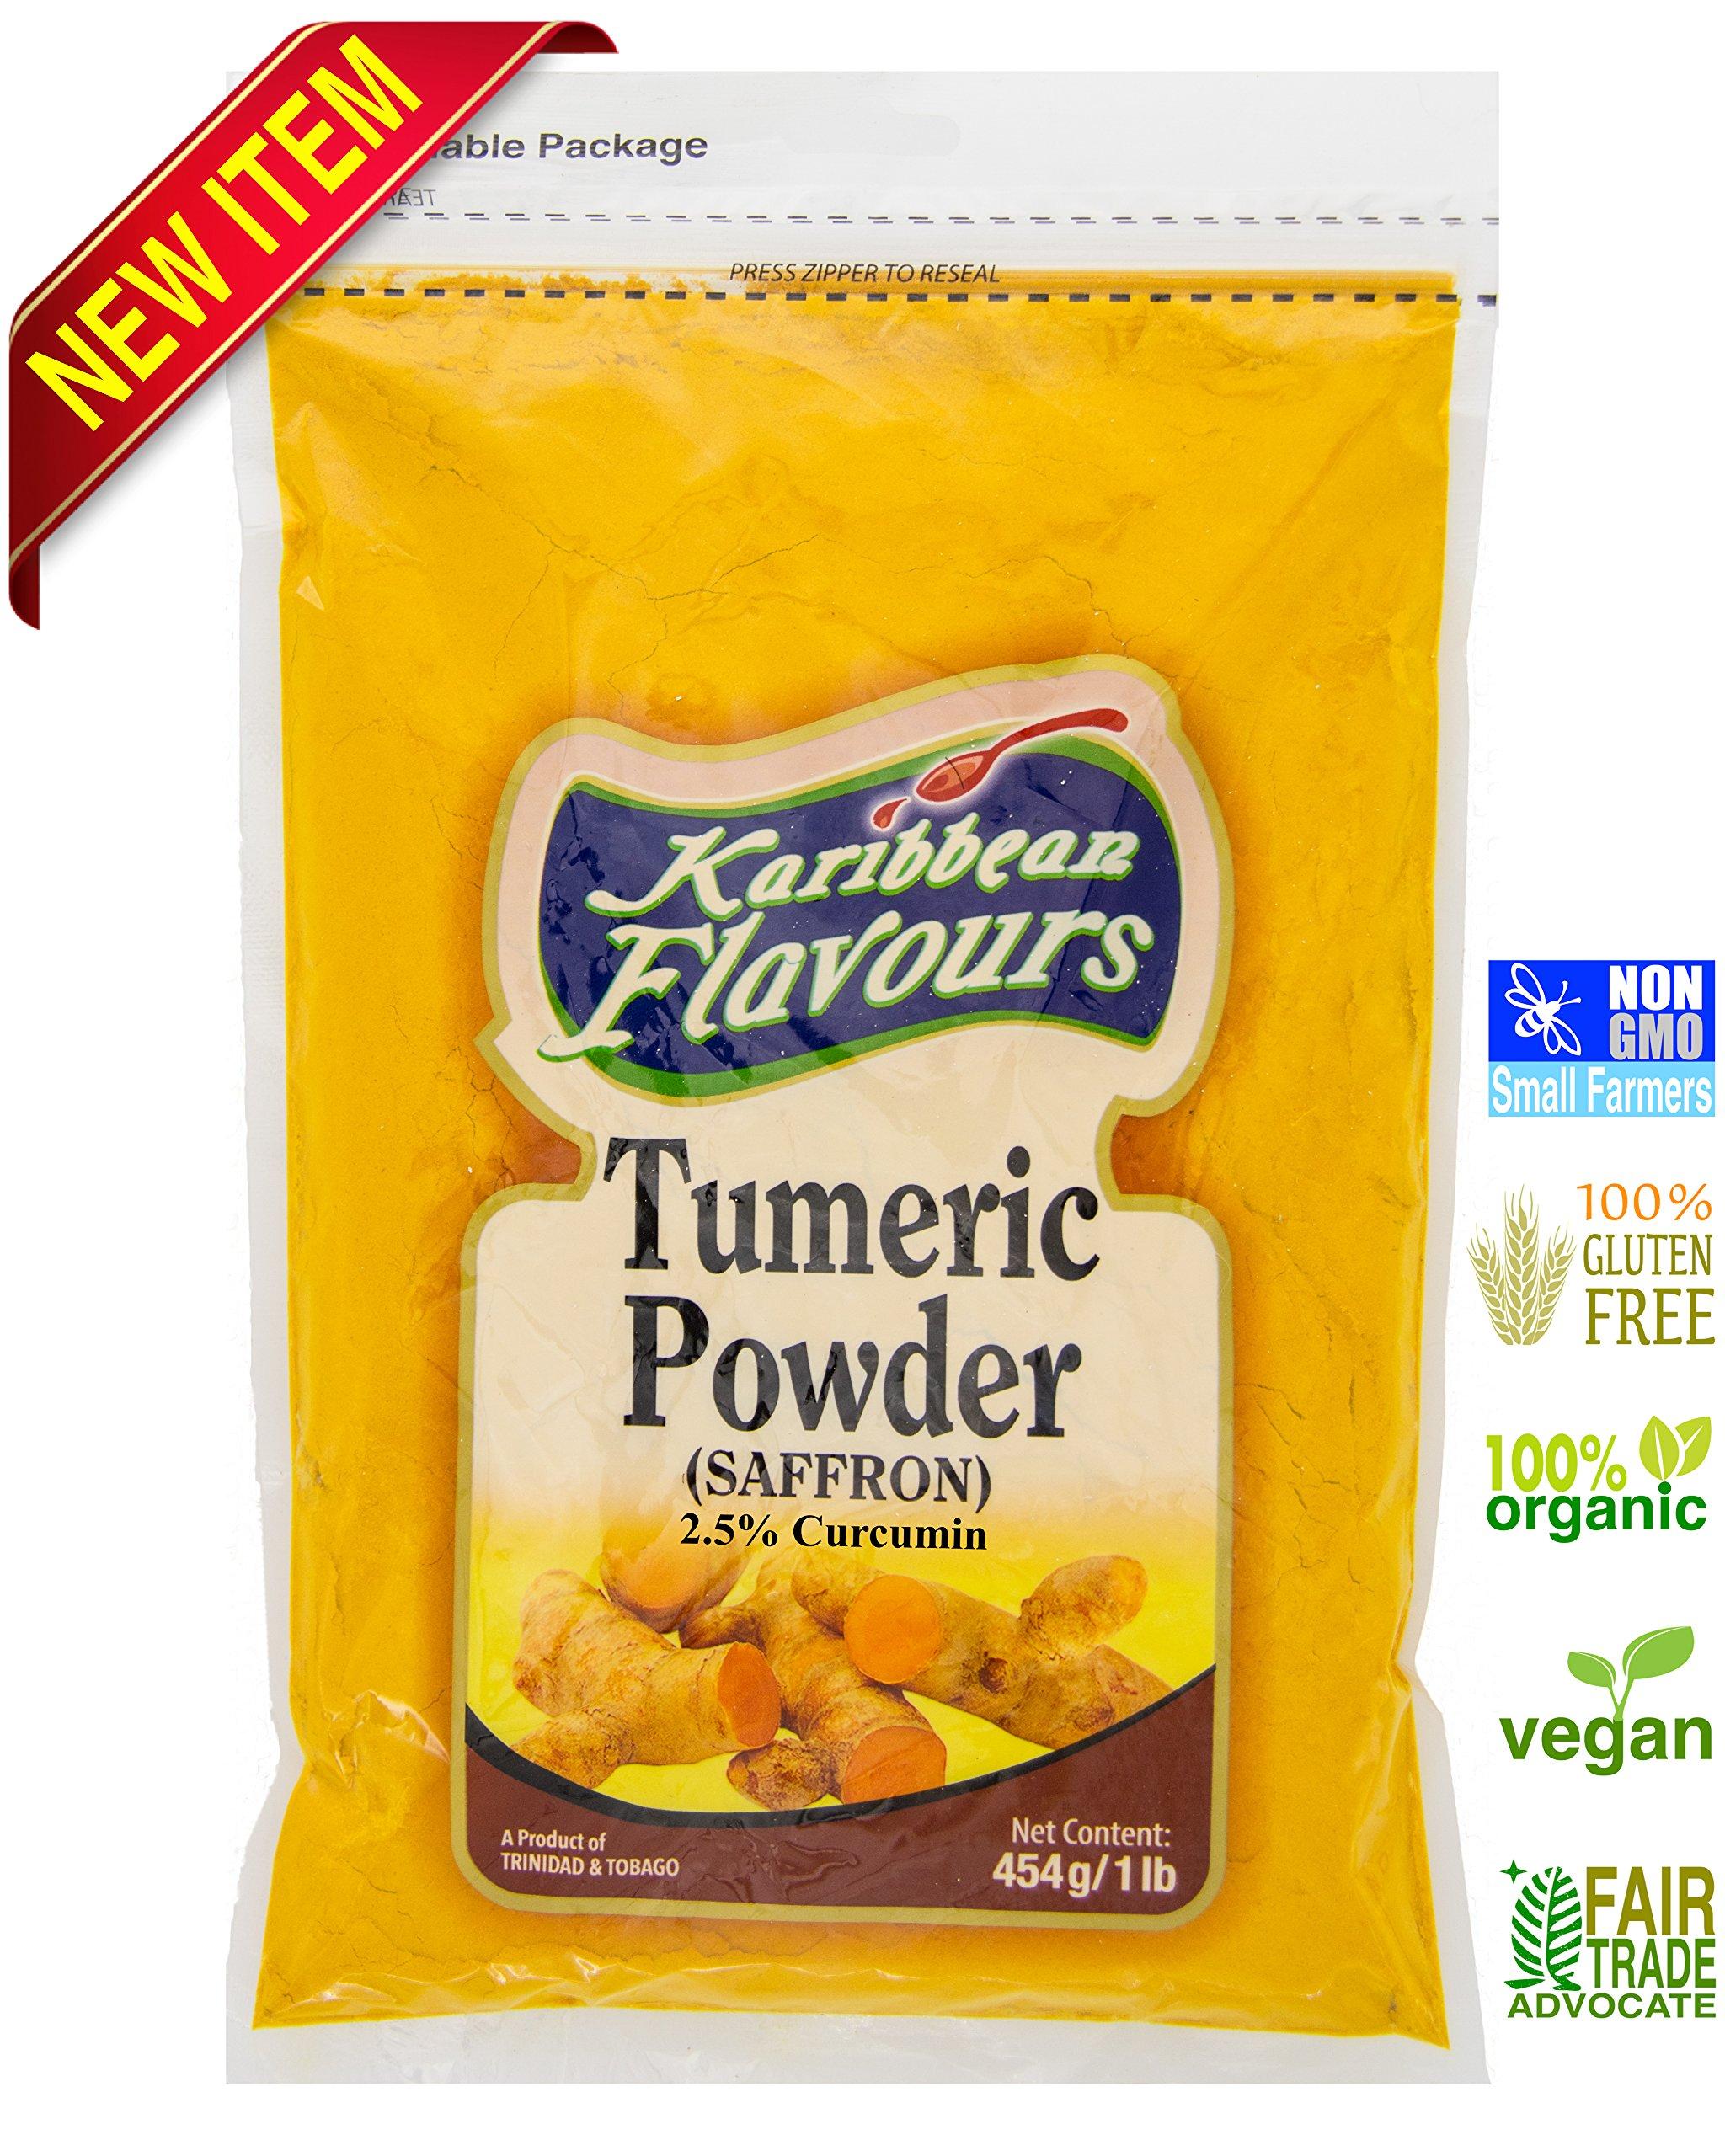 NEW!! Premium Ground Turmeric Root Powder (2.5% curcumin) 1 lb. (454 g) - organic, vegan, non-gmo Tumeric